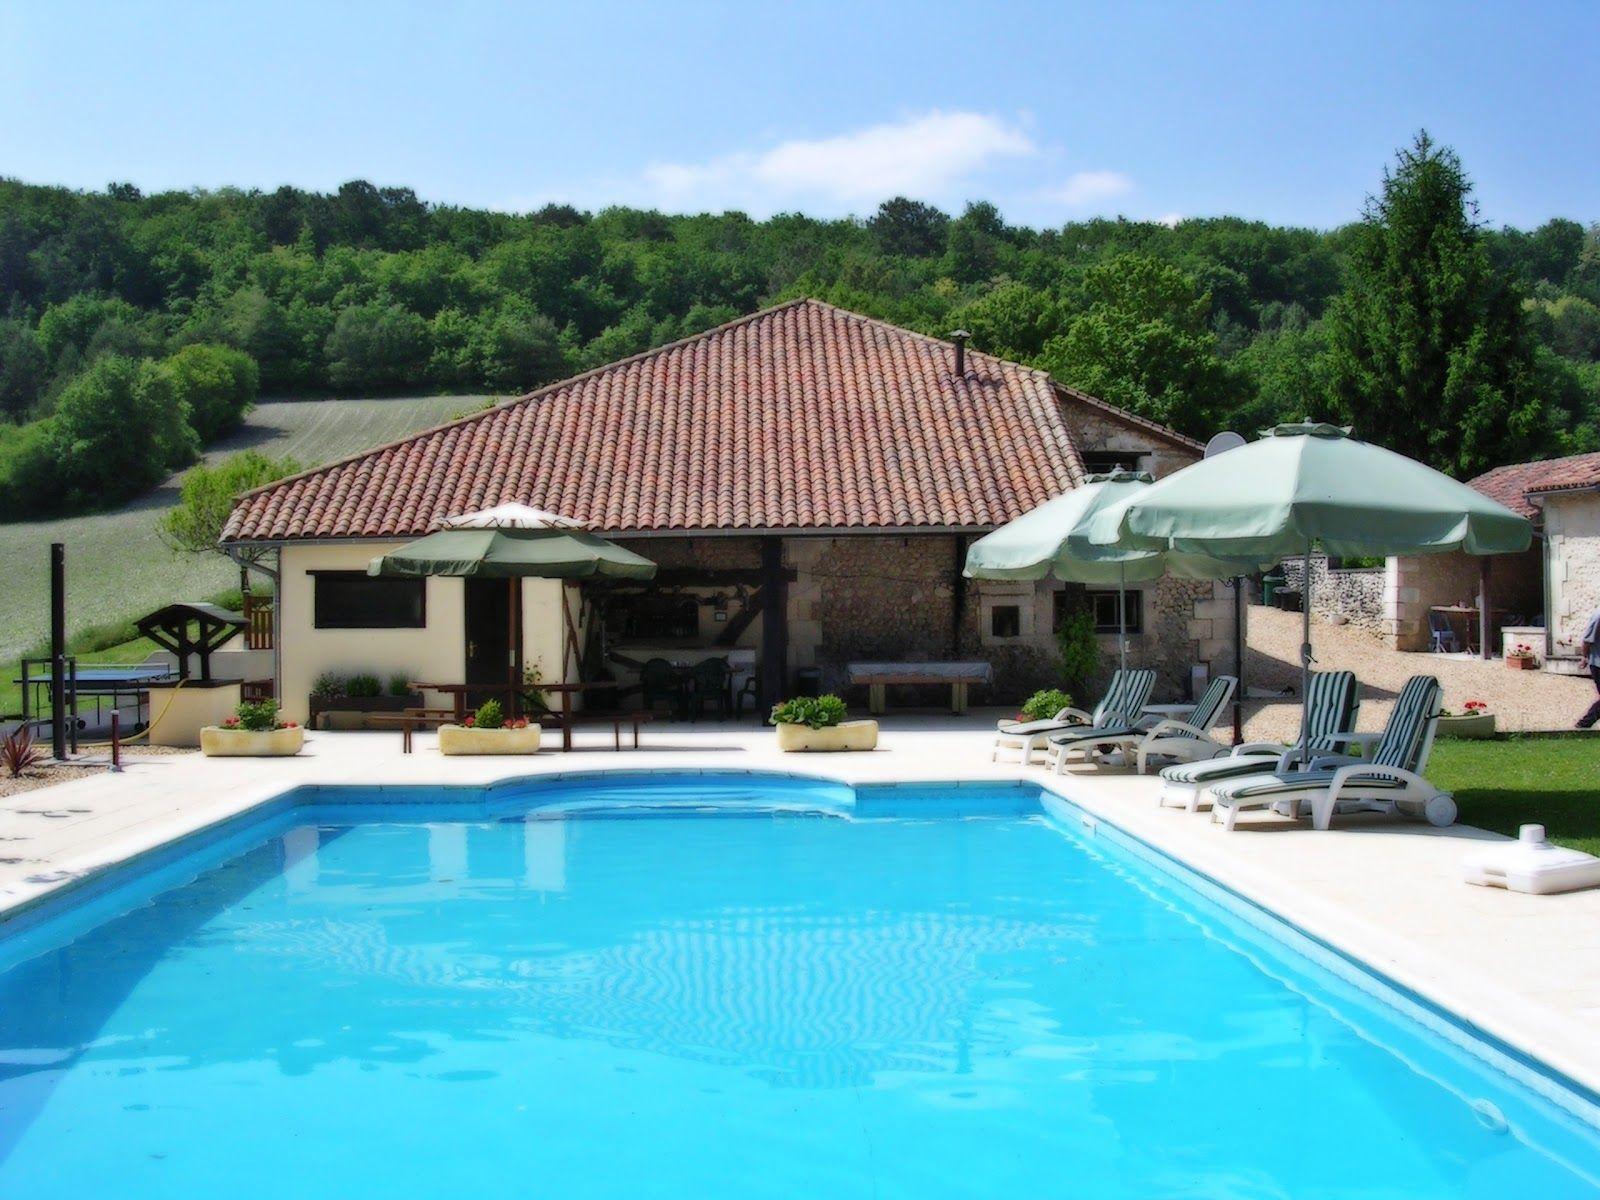 Backyard Landscaping Ideas Swimming Pool Design [ Read More At  Www.homesthetics.net